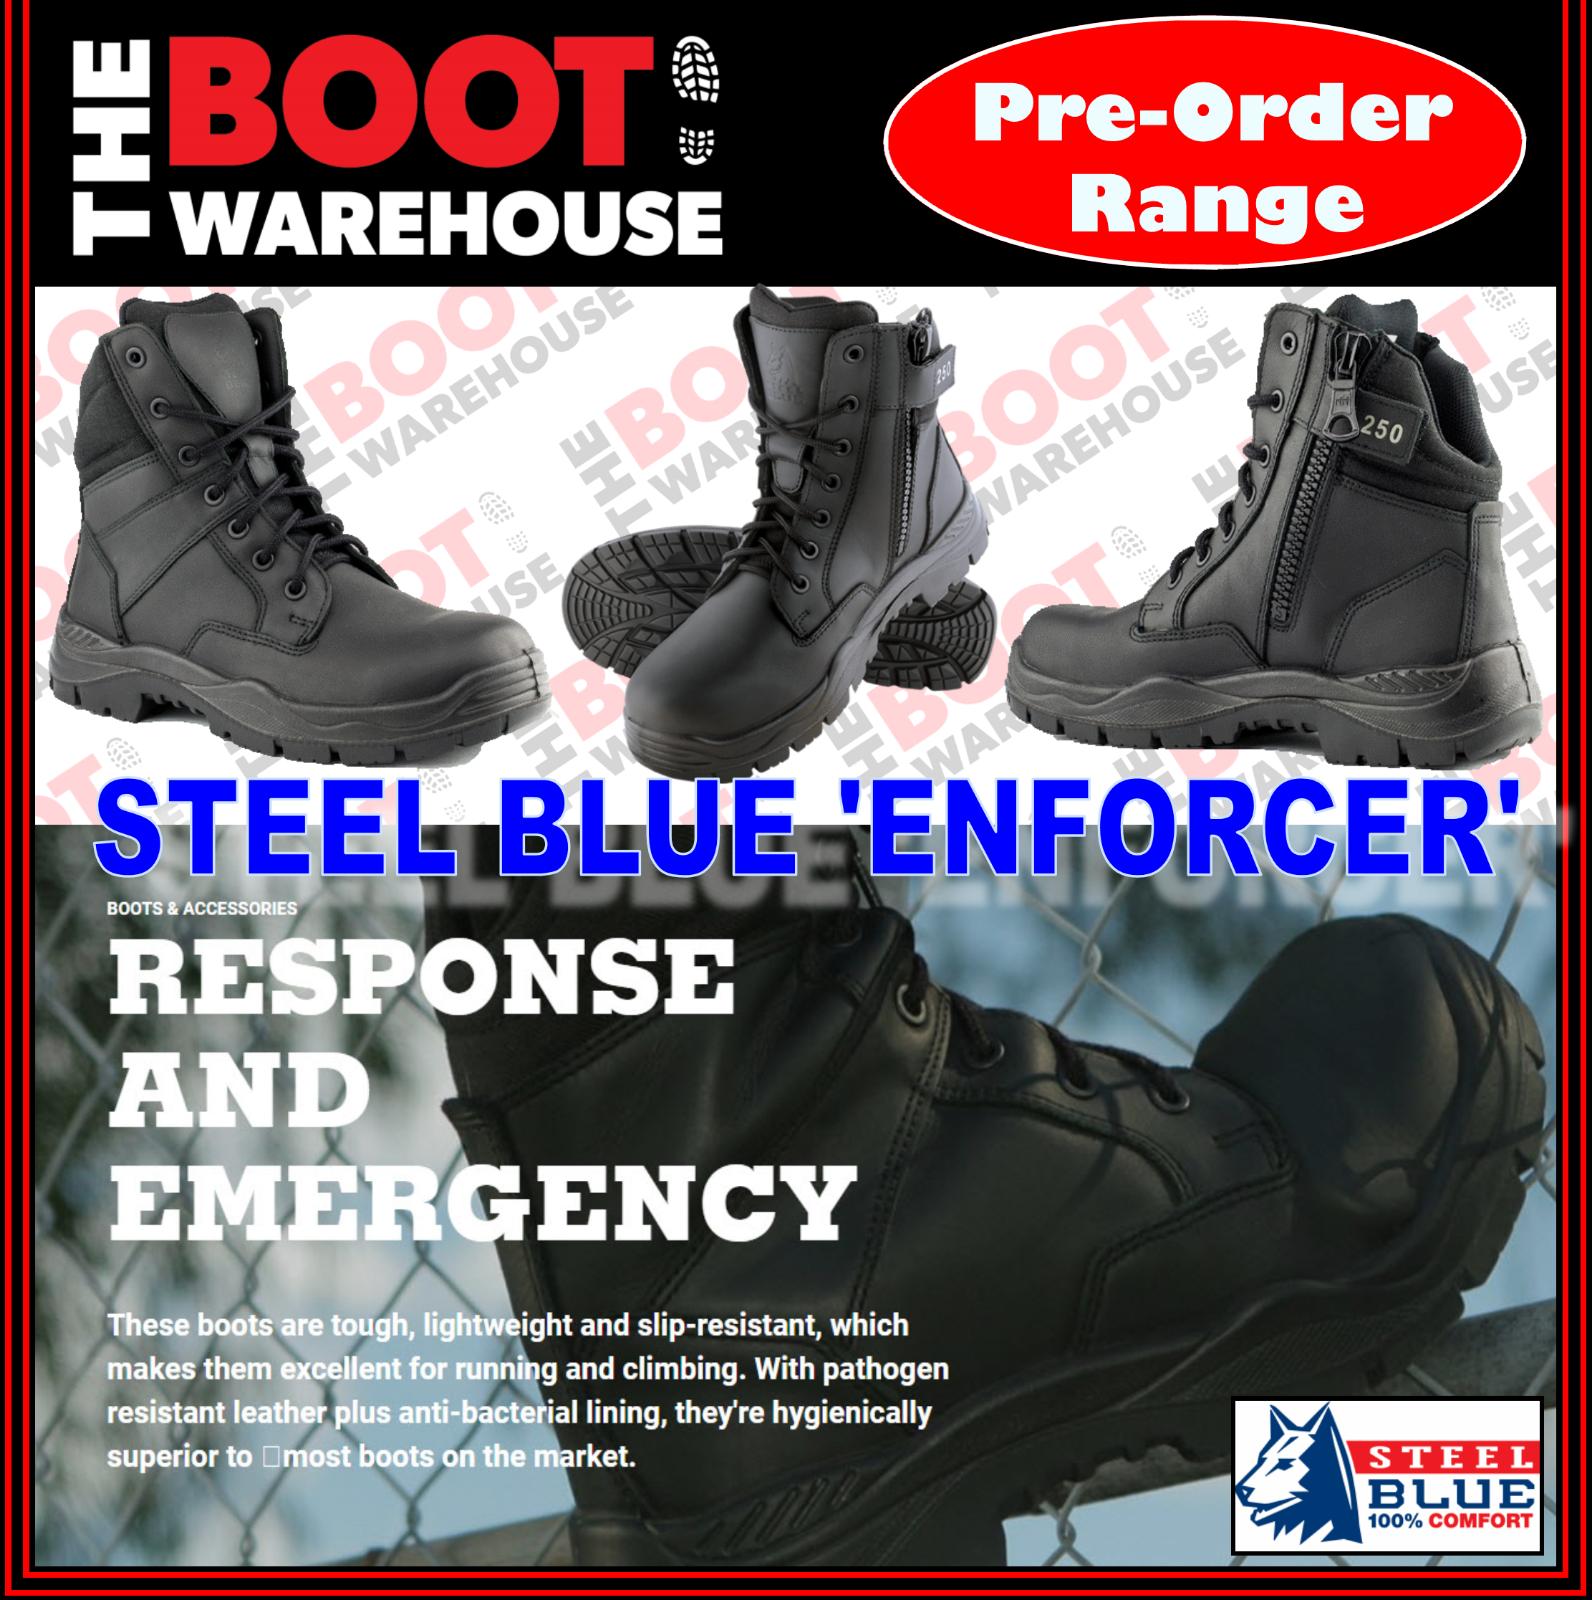 Steel Blau, 320250 ENFORCER. Soft Toe Stiefel. Police. Security. Emergency Services